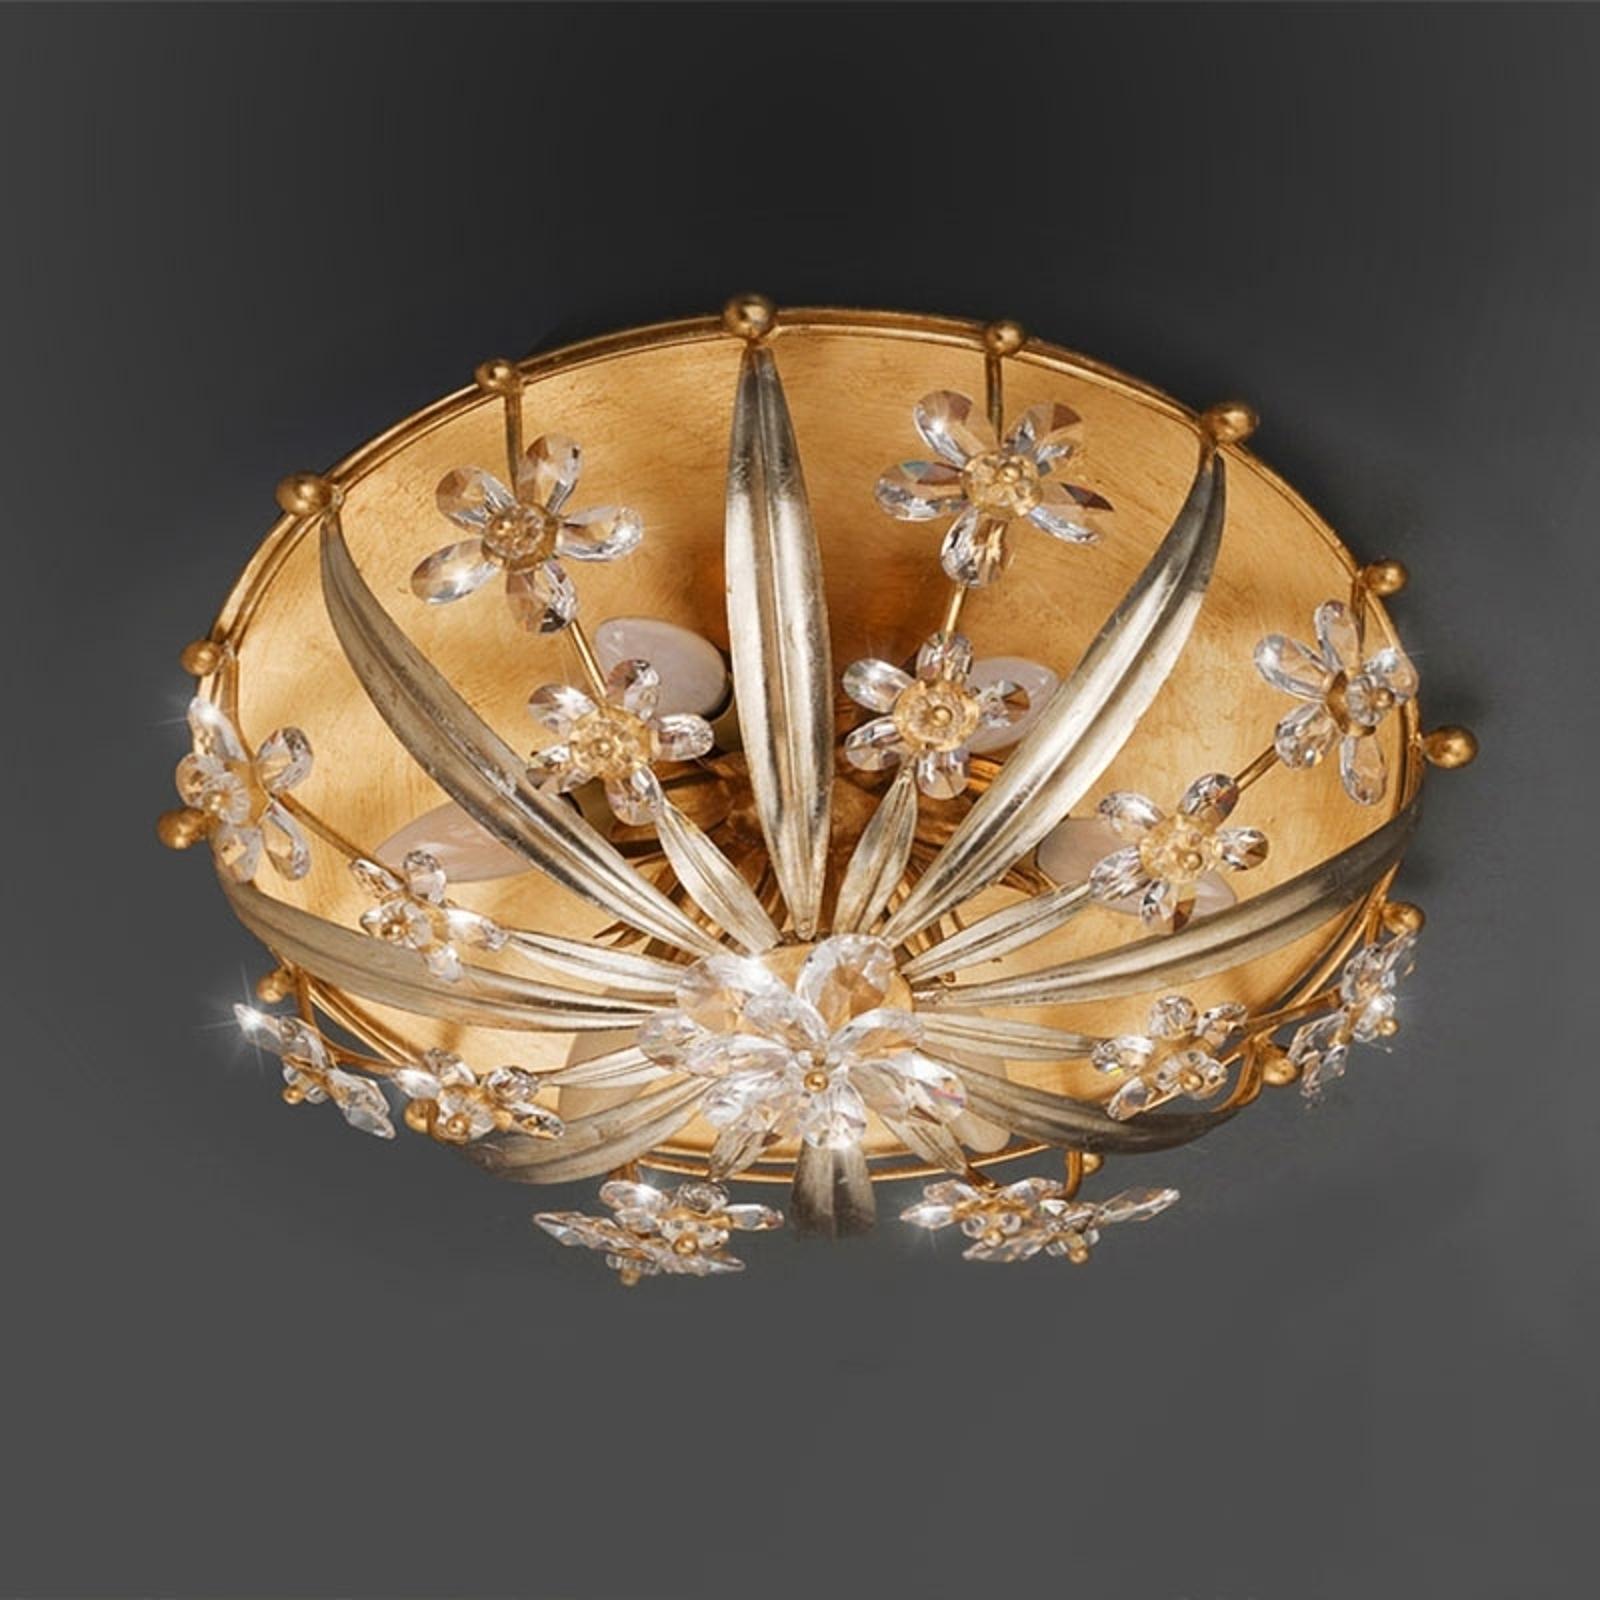 Weelderige kristallen plafondlamp Mirella